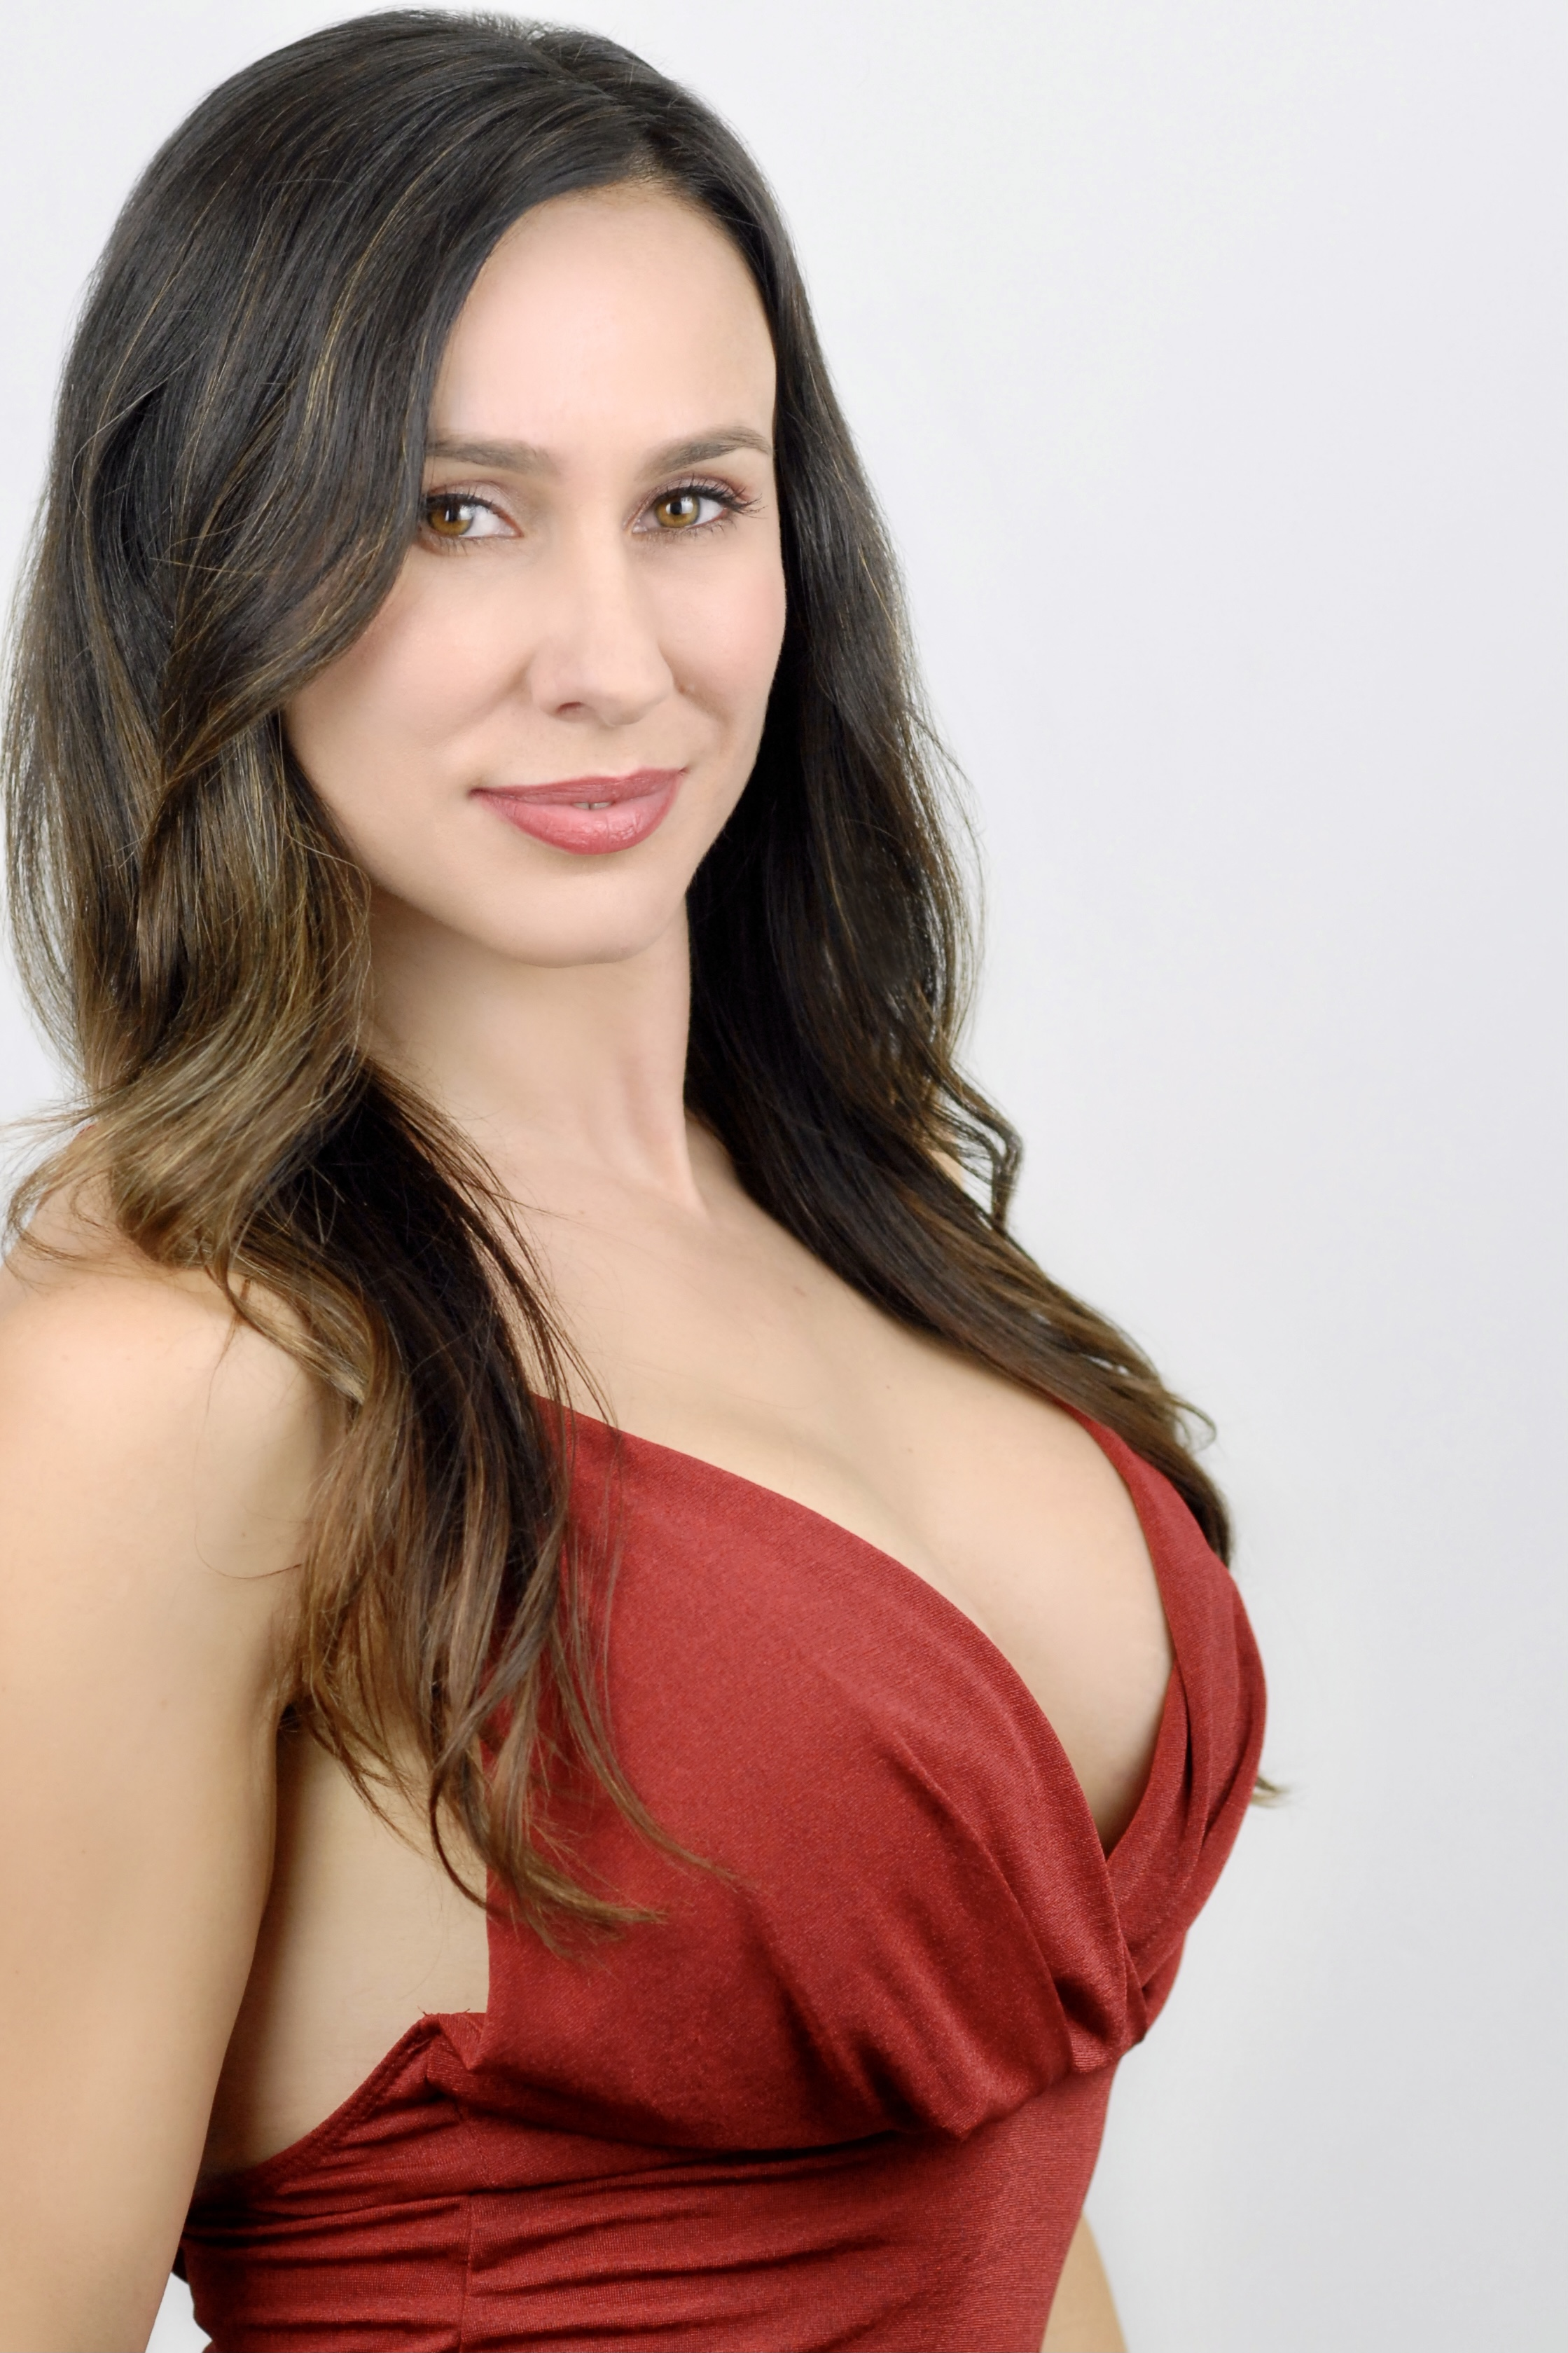 Christina robinson hot